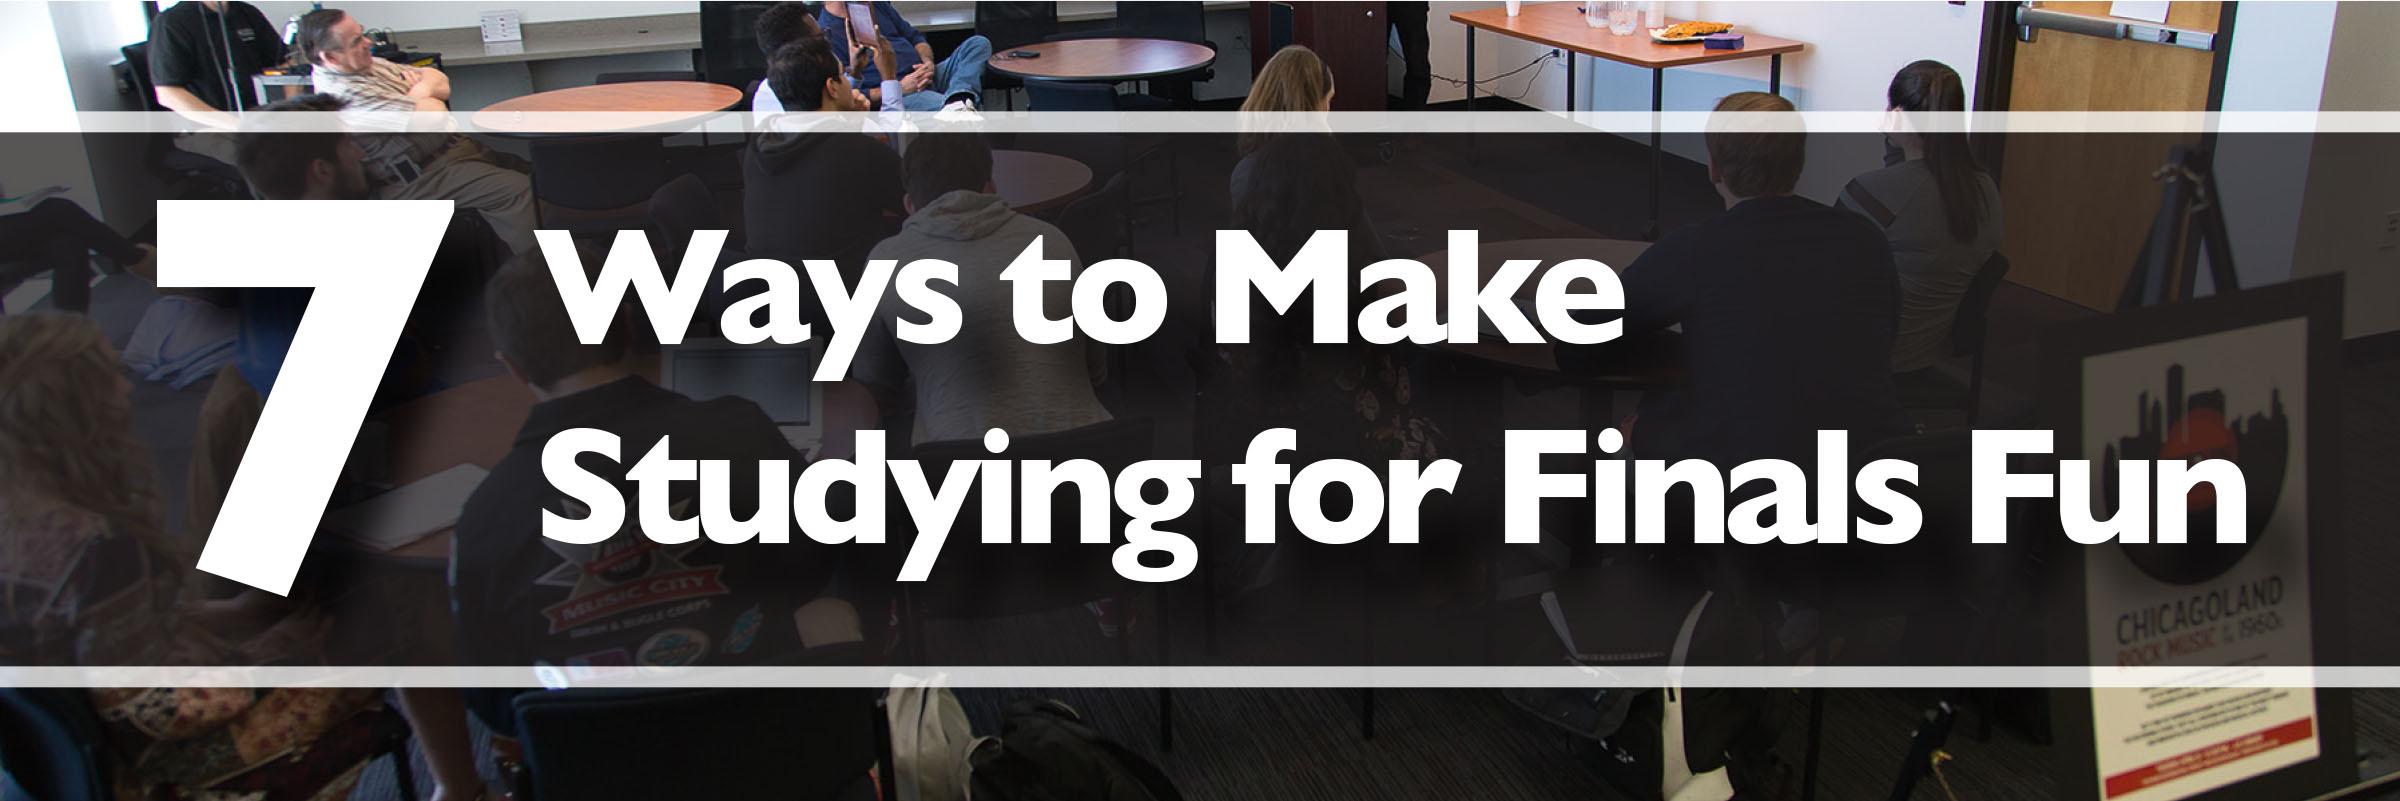 7 ways to make studying for finals fun banner jjc joliet junior college